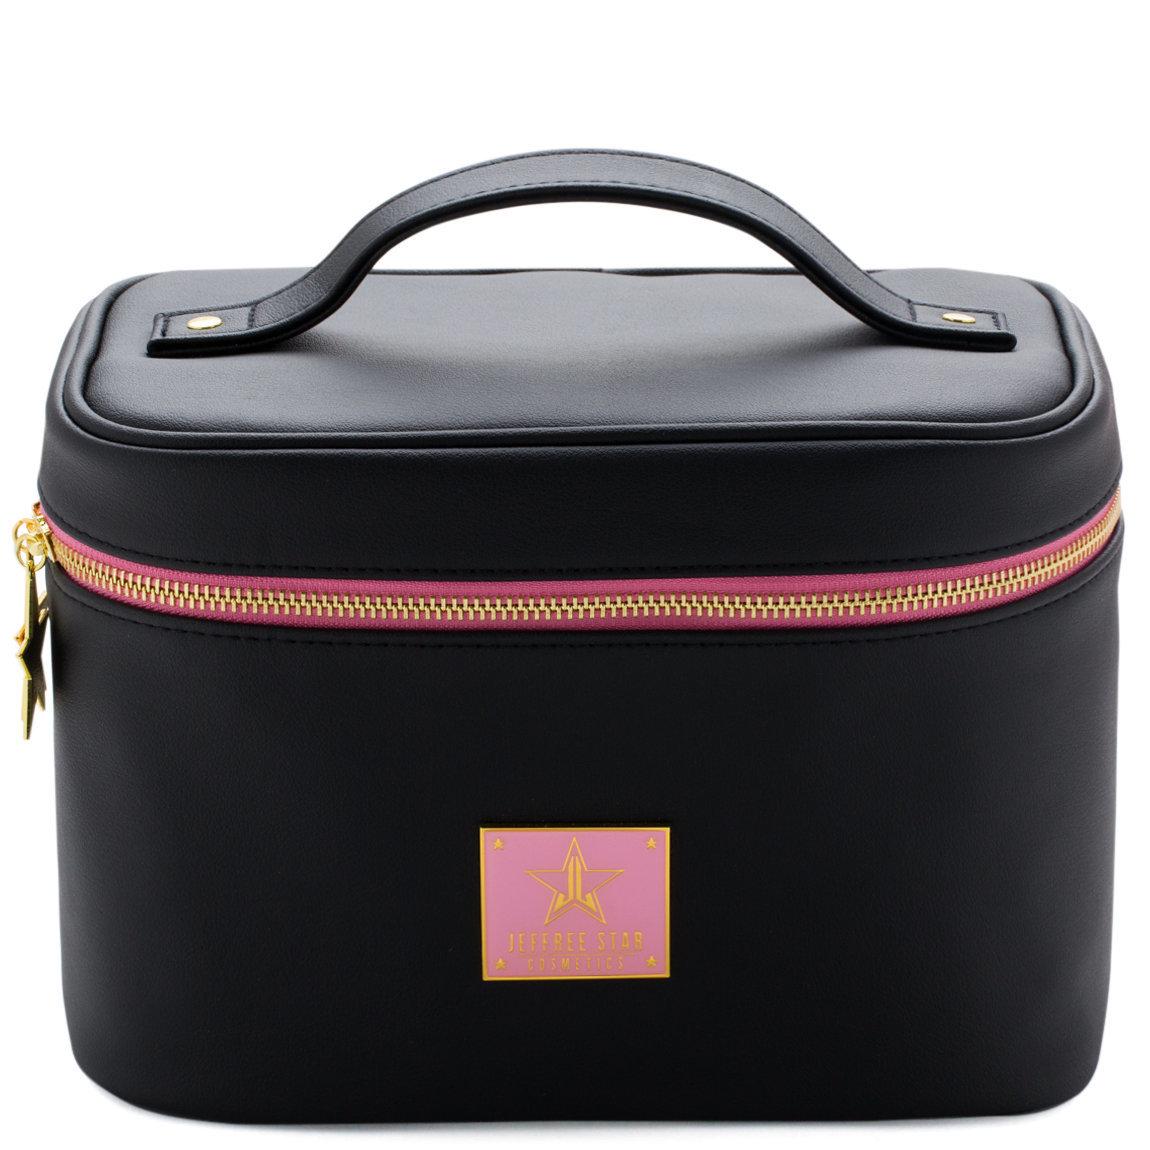 Jeffree Star Cosmetics Travel Makeup Bag Black product smear.